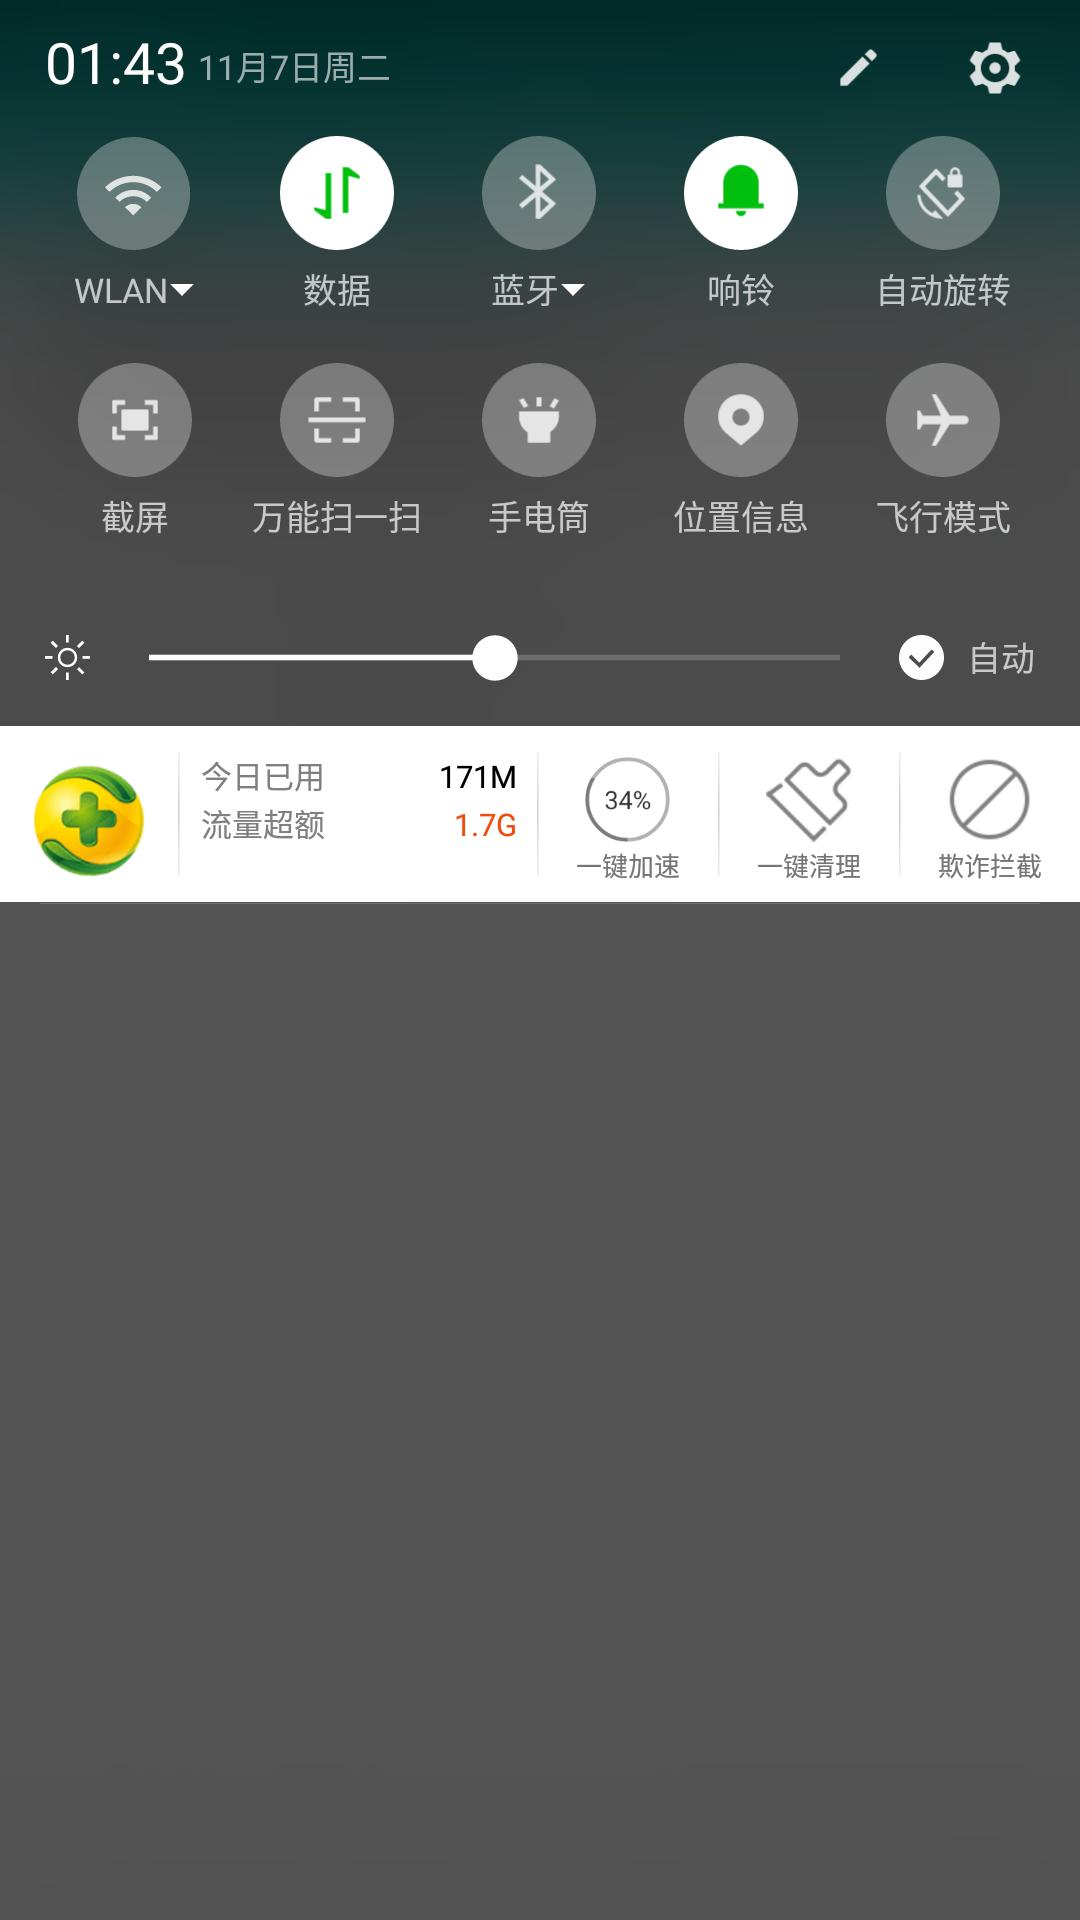 Screenshot_2017-11-07-01-43-04.png